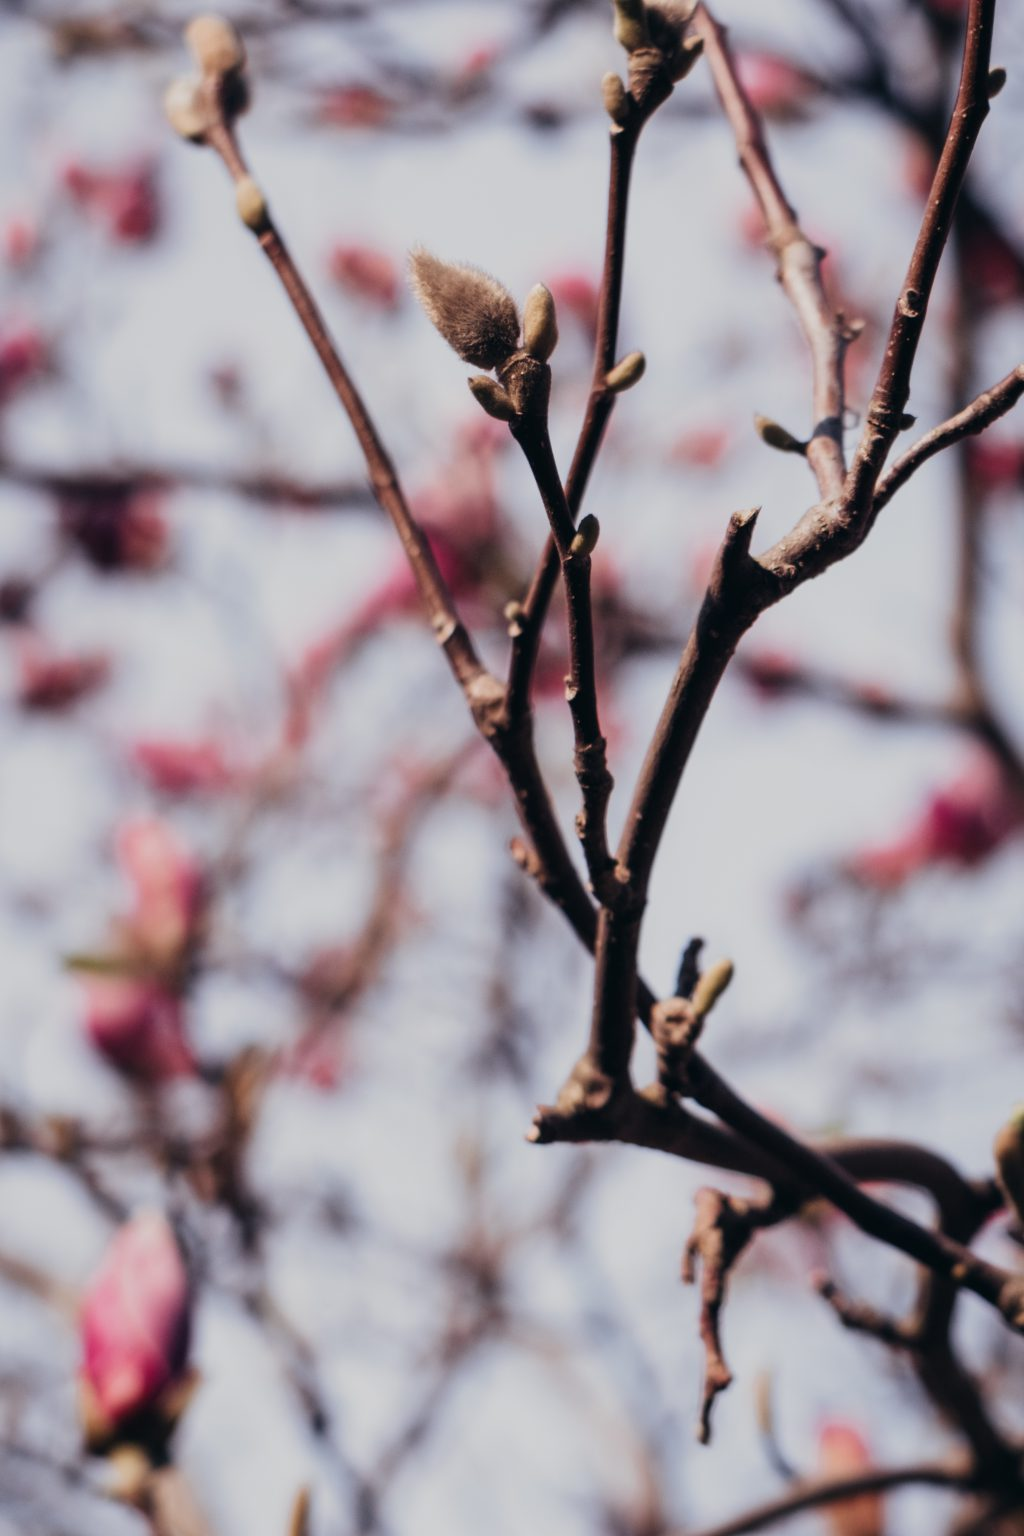 Magnolia tree blossom 12 - free stock photo